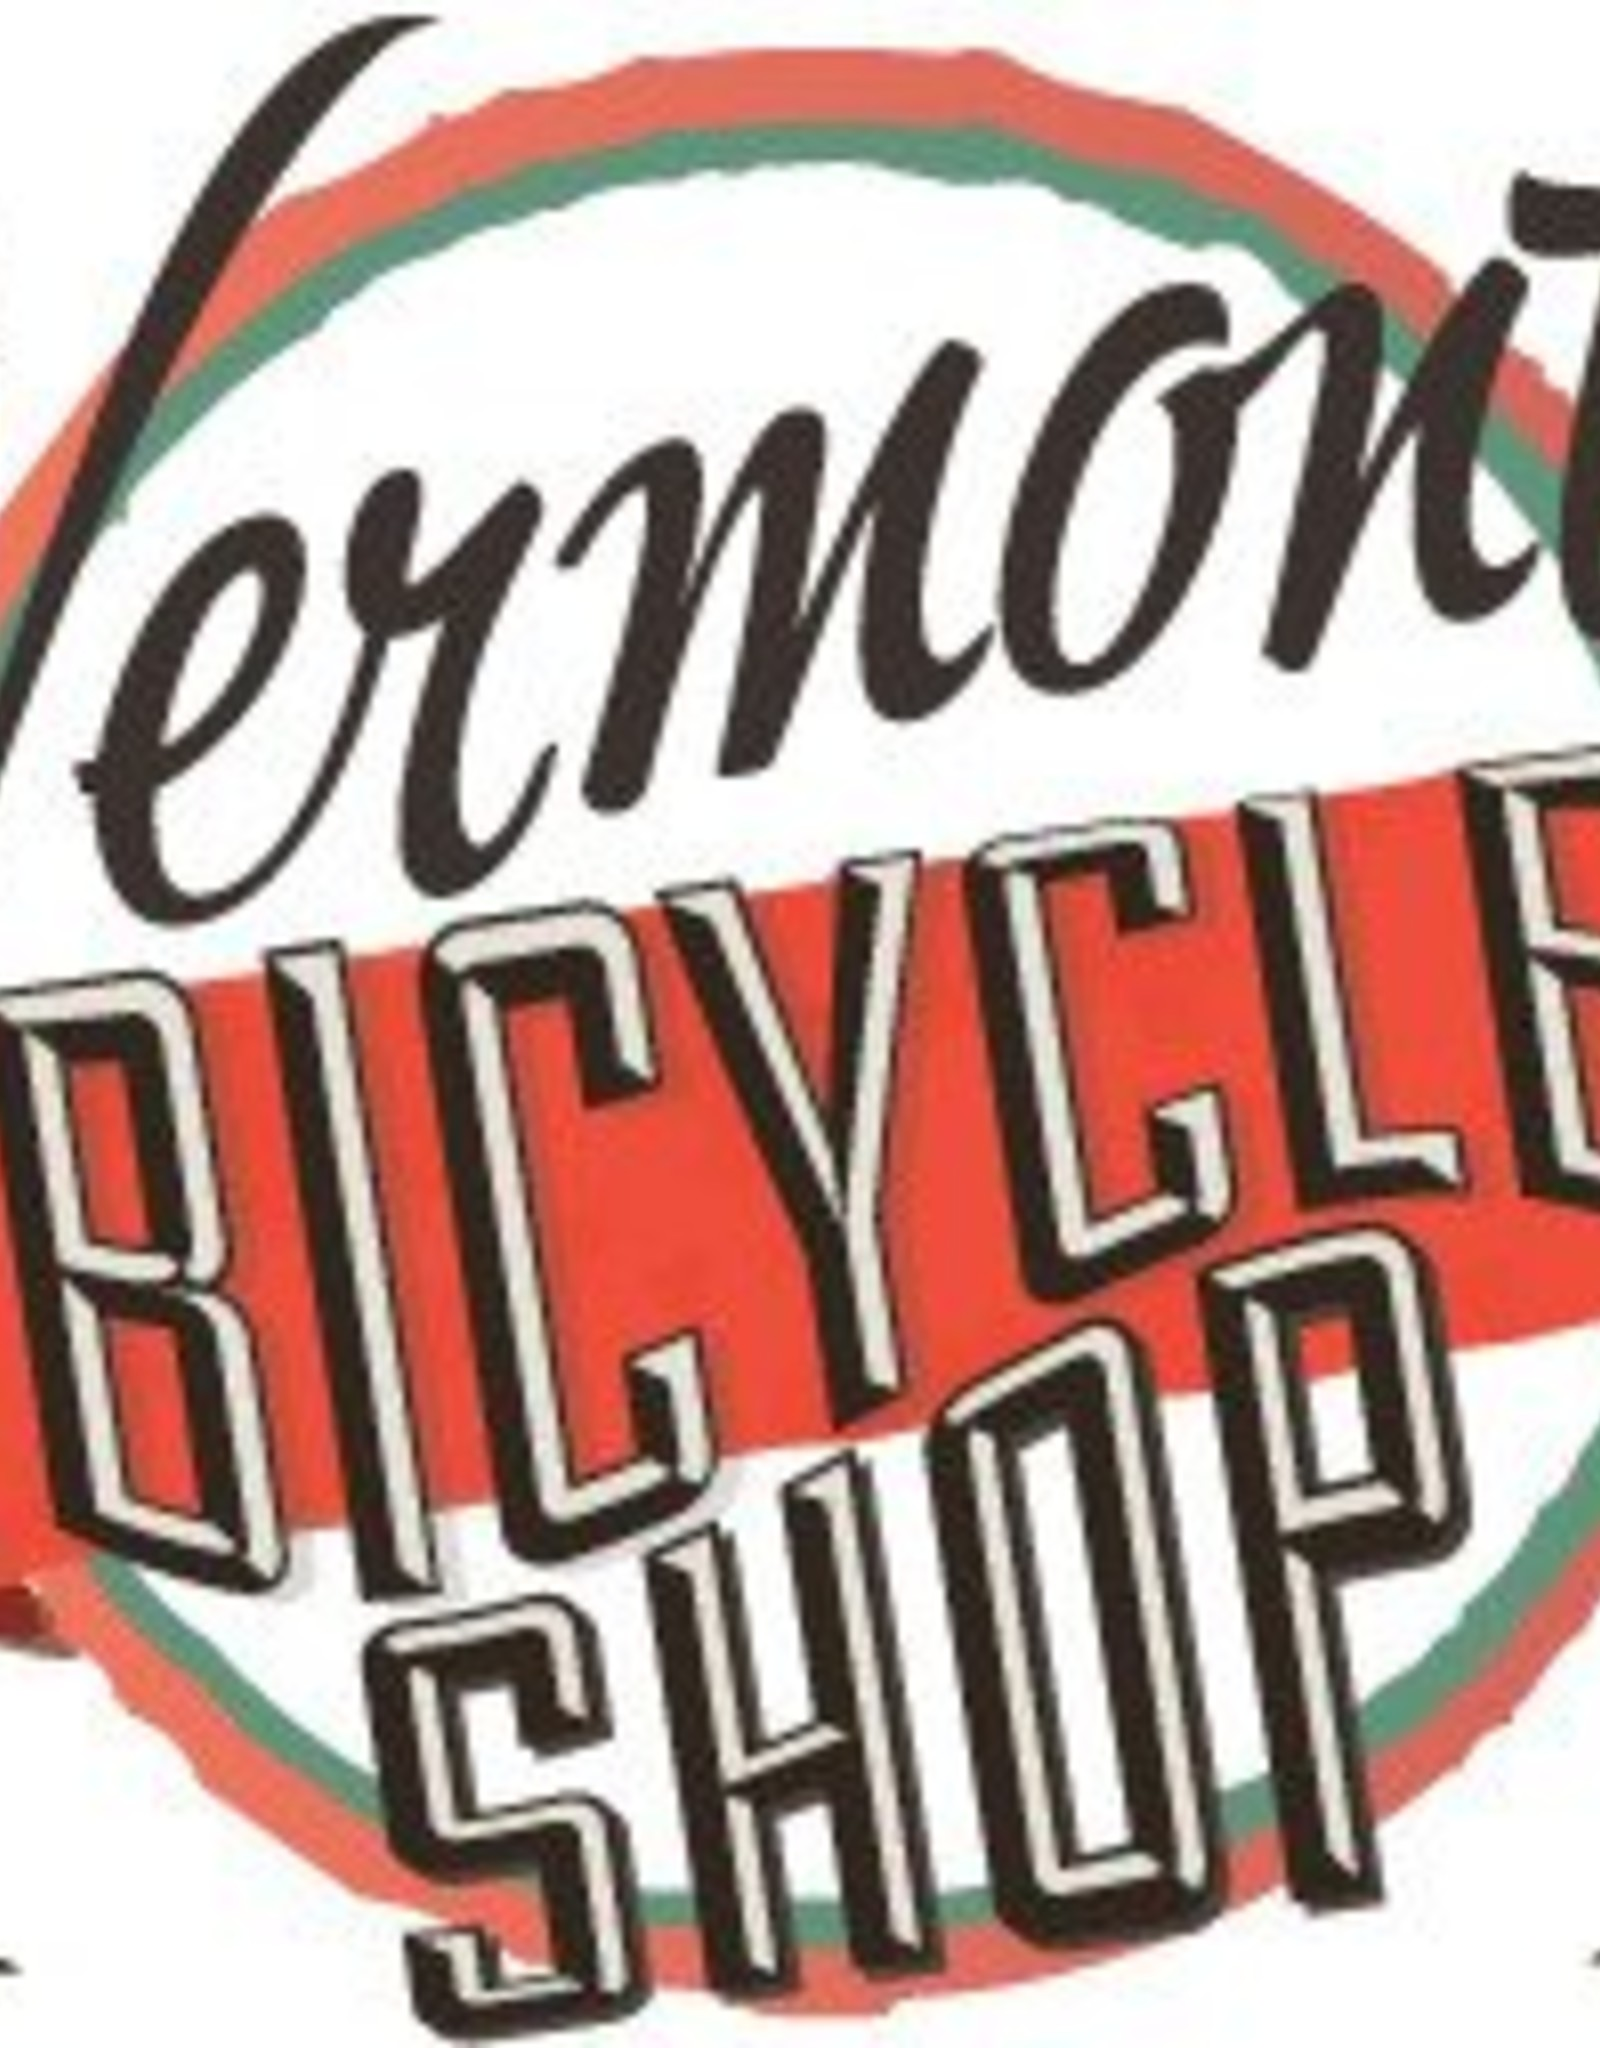 Vermont Bicycle Shop Granite City Fitness Spin Bike Repair 8/8